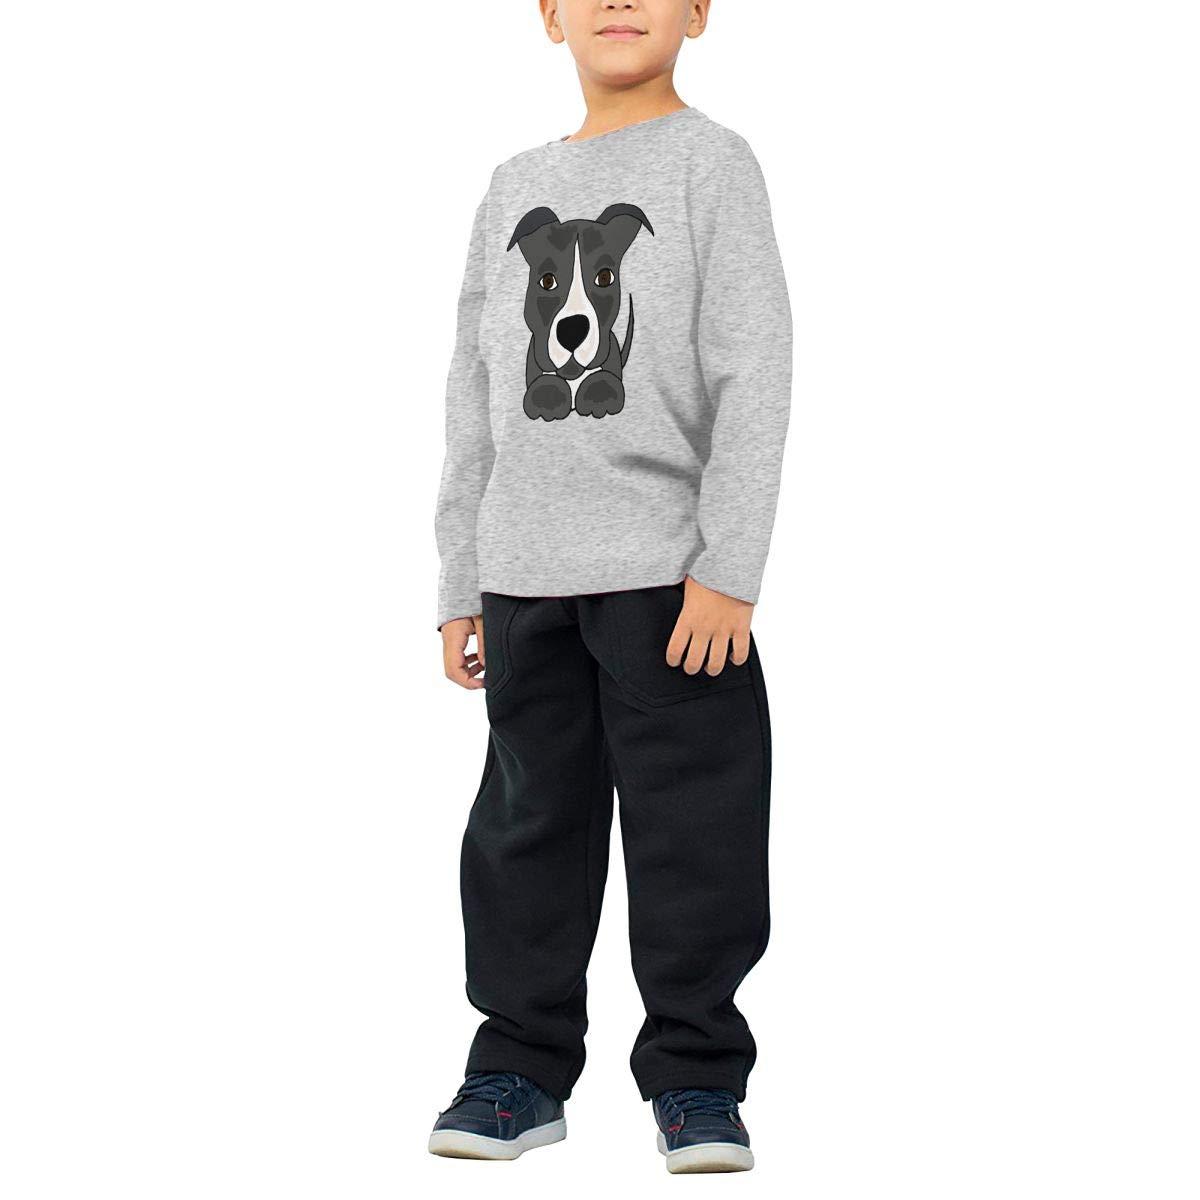 SKYAKLJA Cute Pitbull Puppy Dog Childrens Gray Cotton Long Sleeve Round Neck T Shirt for Boy Or Girl